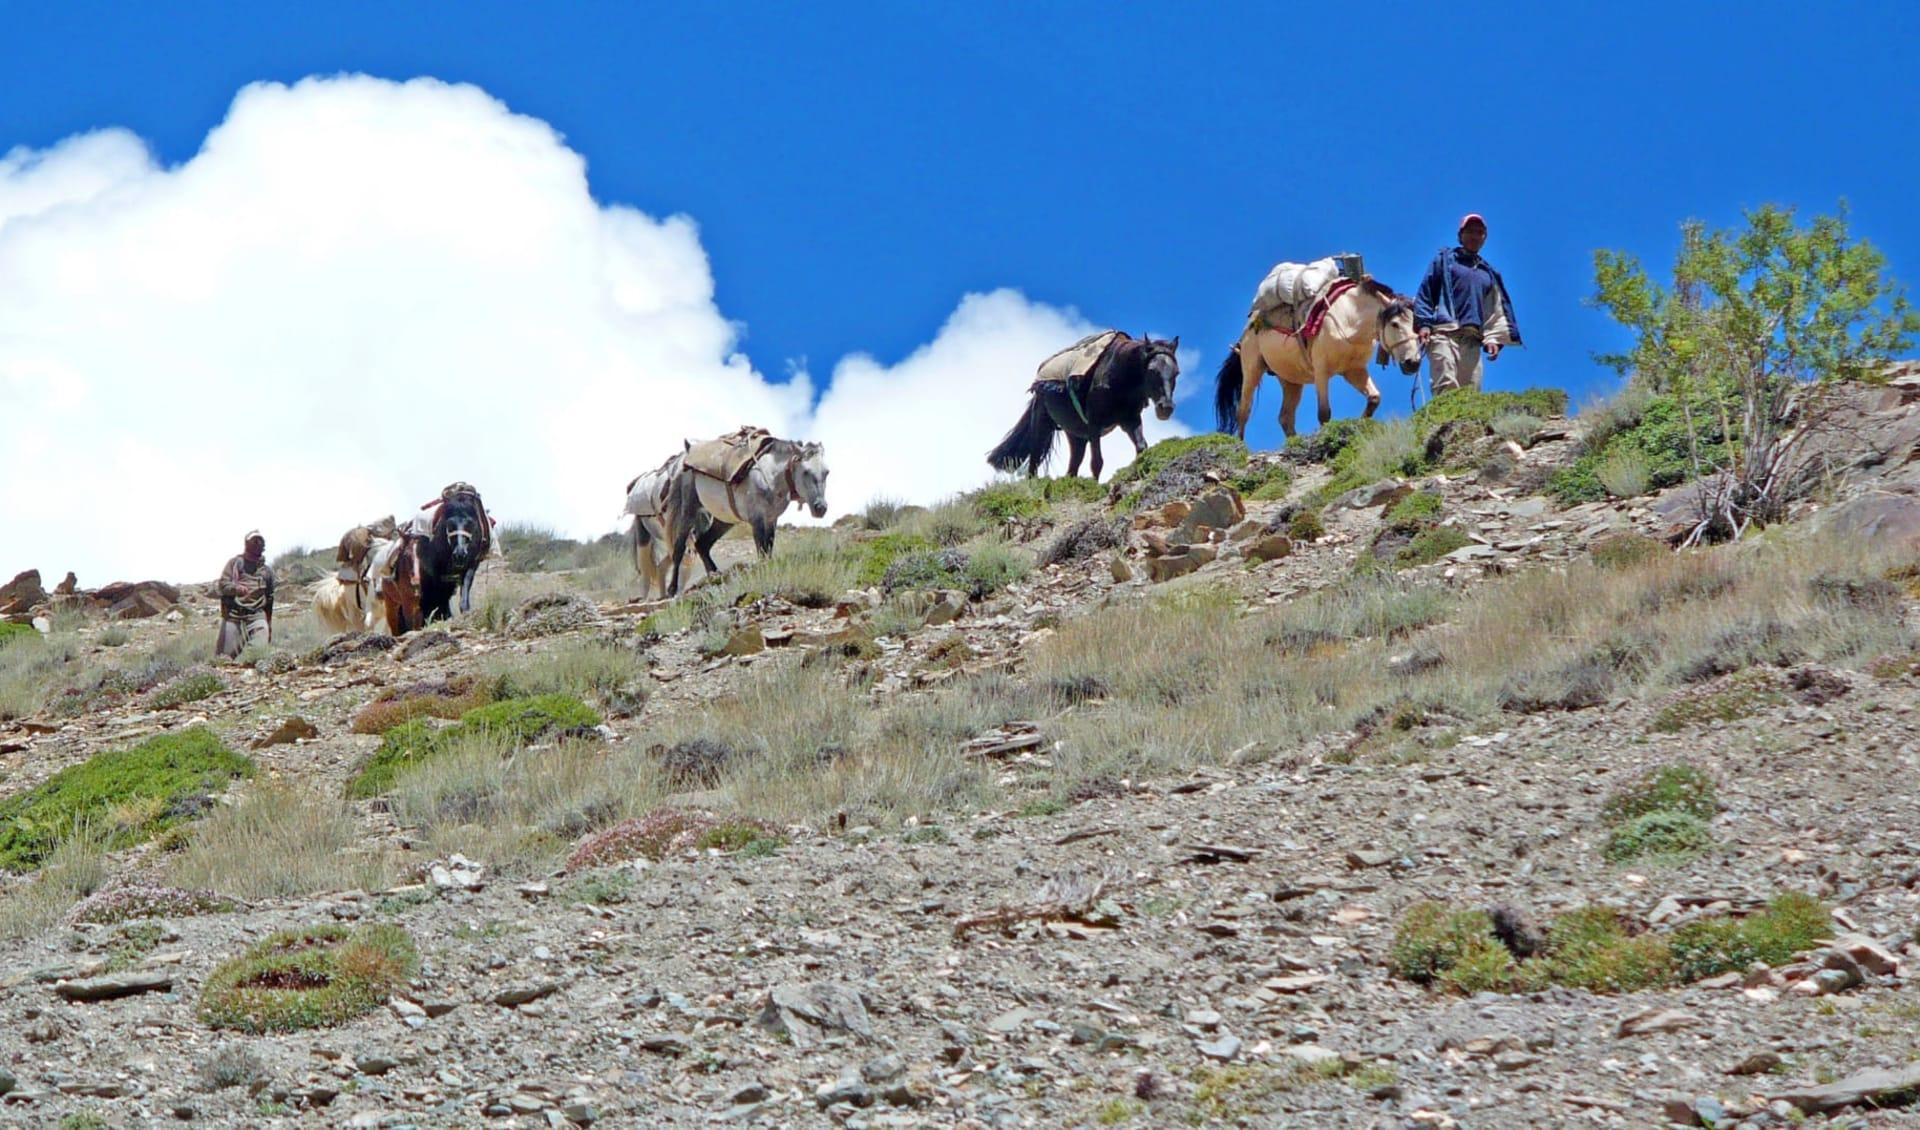 Die spektakuläre Bergwelt von Ladakh ab Leh: Ladakh: two men with horses